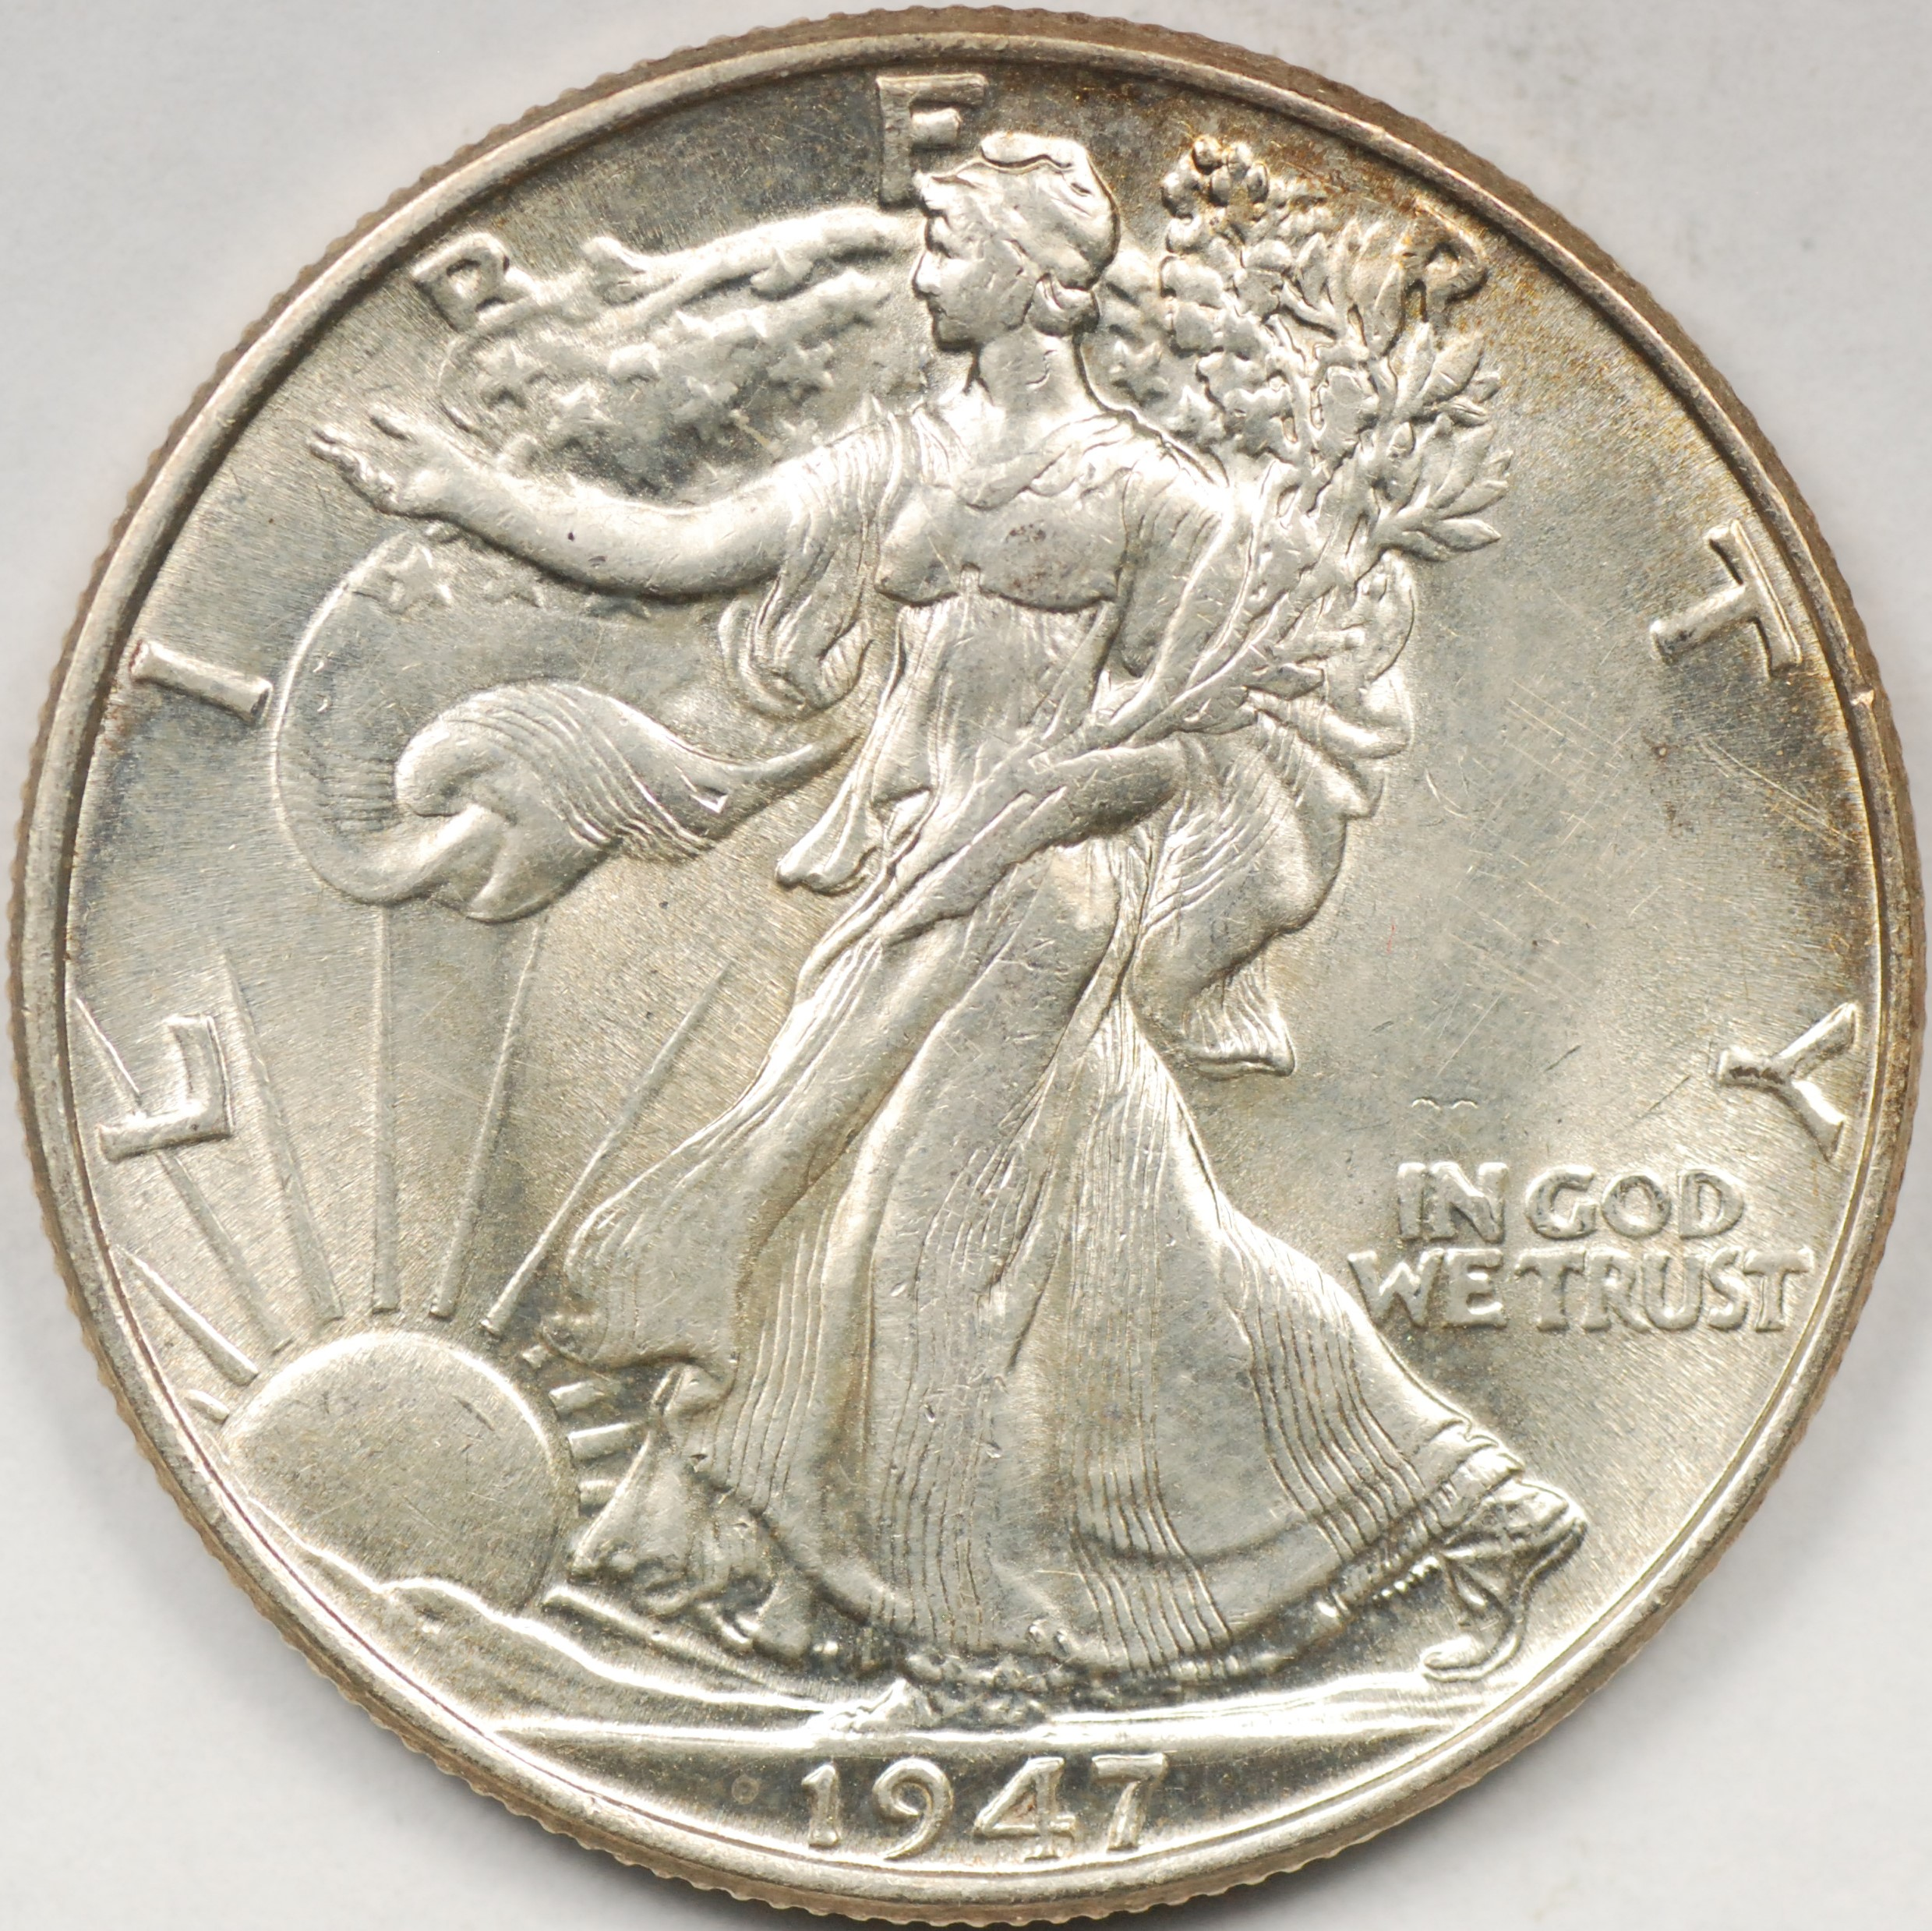 1947 walking liberty coin value